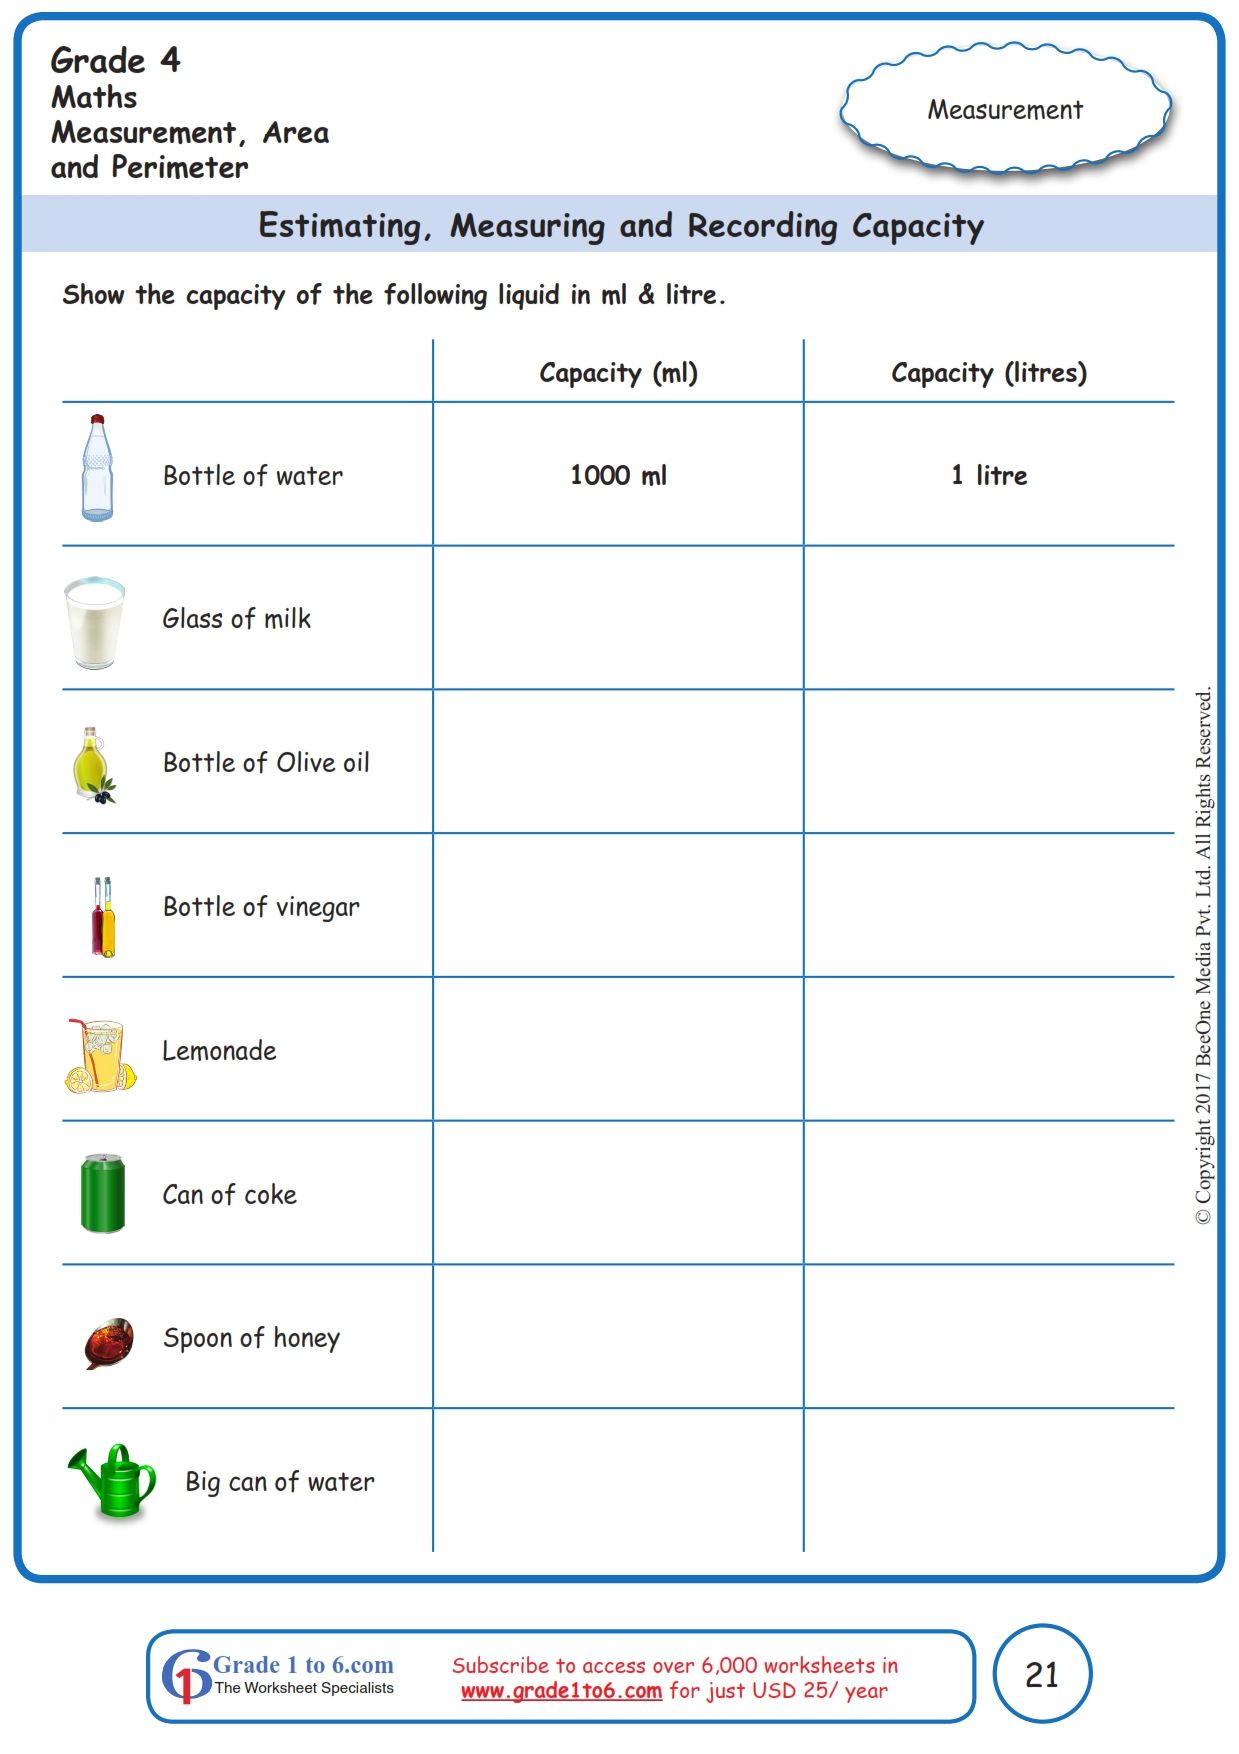 120 Grade 4 Math Worksheets: PYP/CBSE/ICSE/Common Core ideas   math  worksheets [ 1754 x 1239 Pixel ]